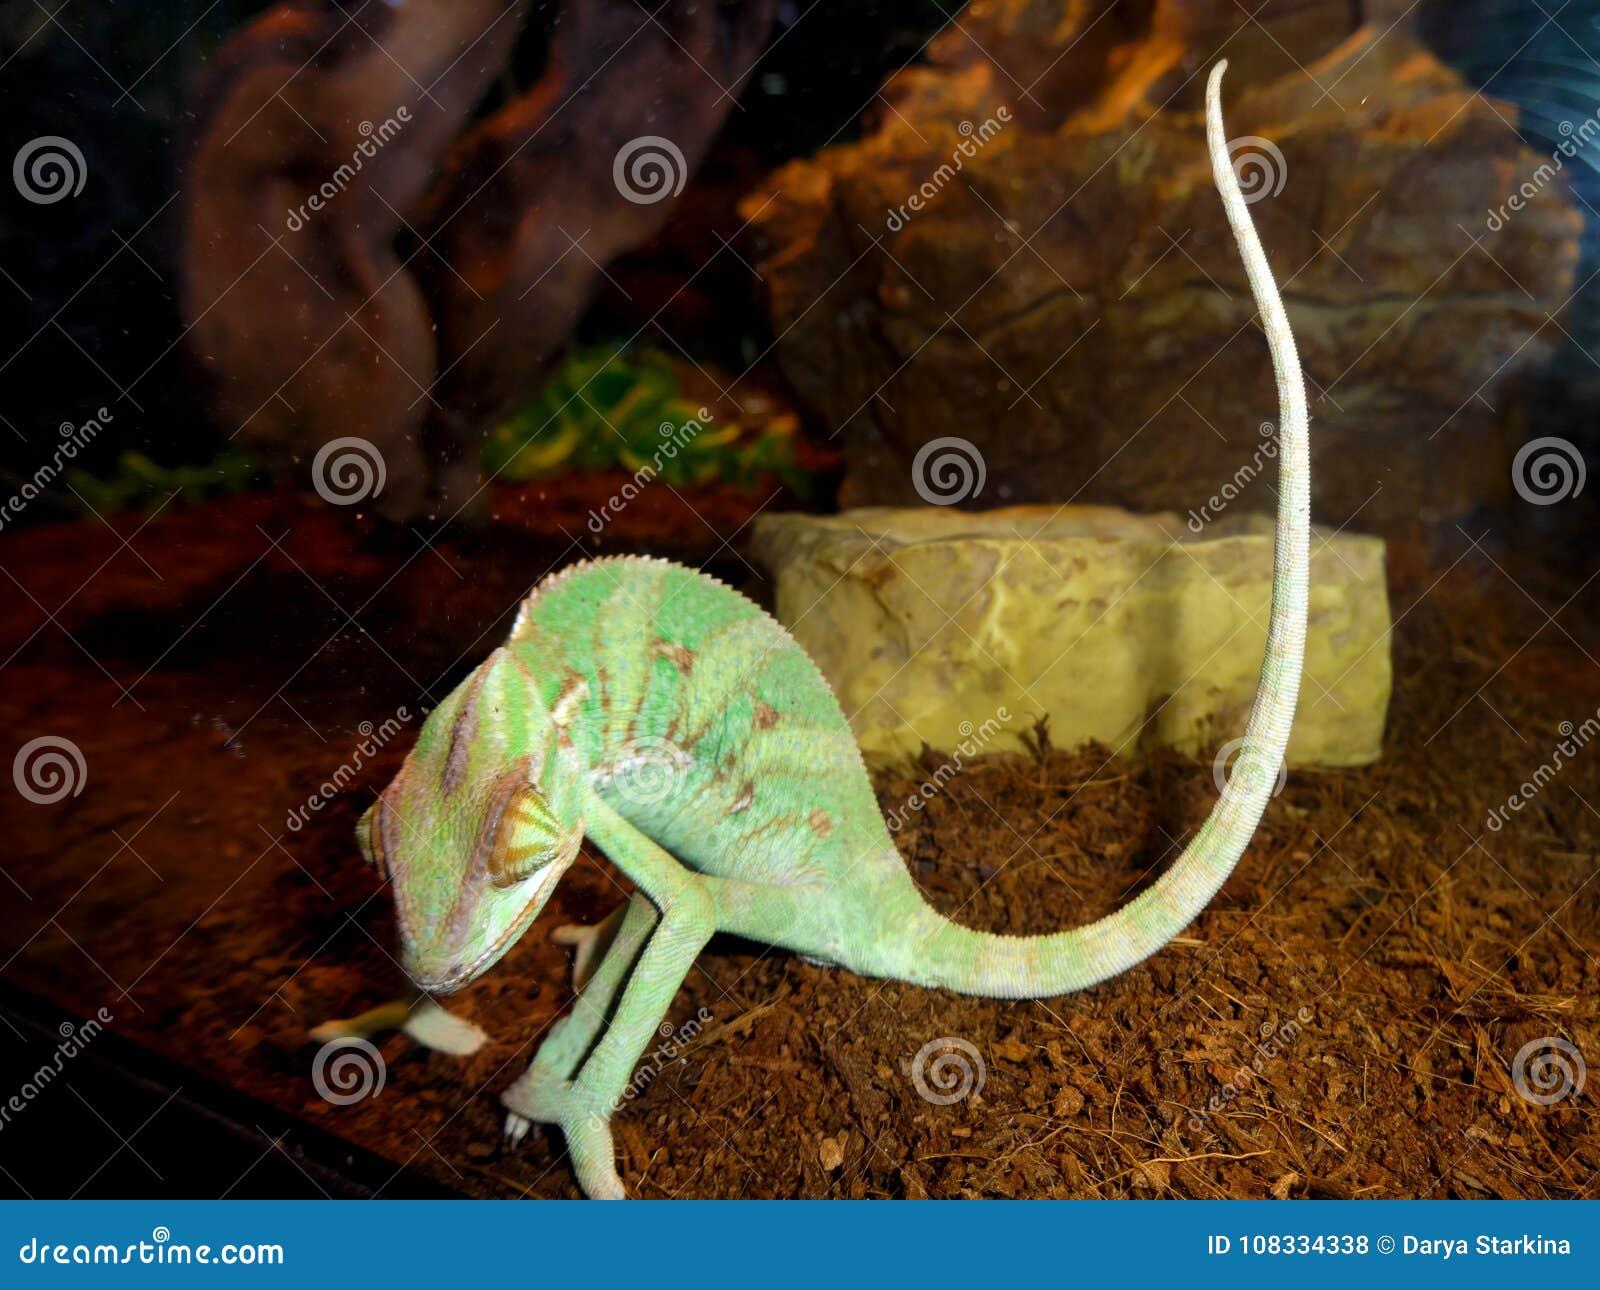 Green Lizard In The Terrarium Stock Photo Image Of Green